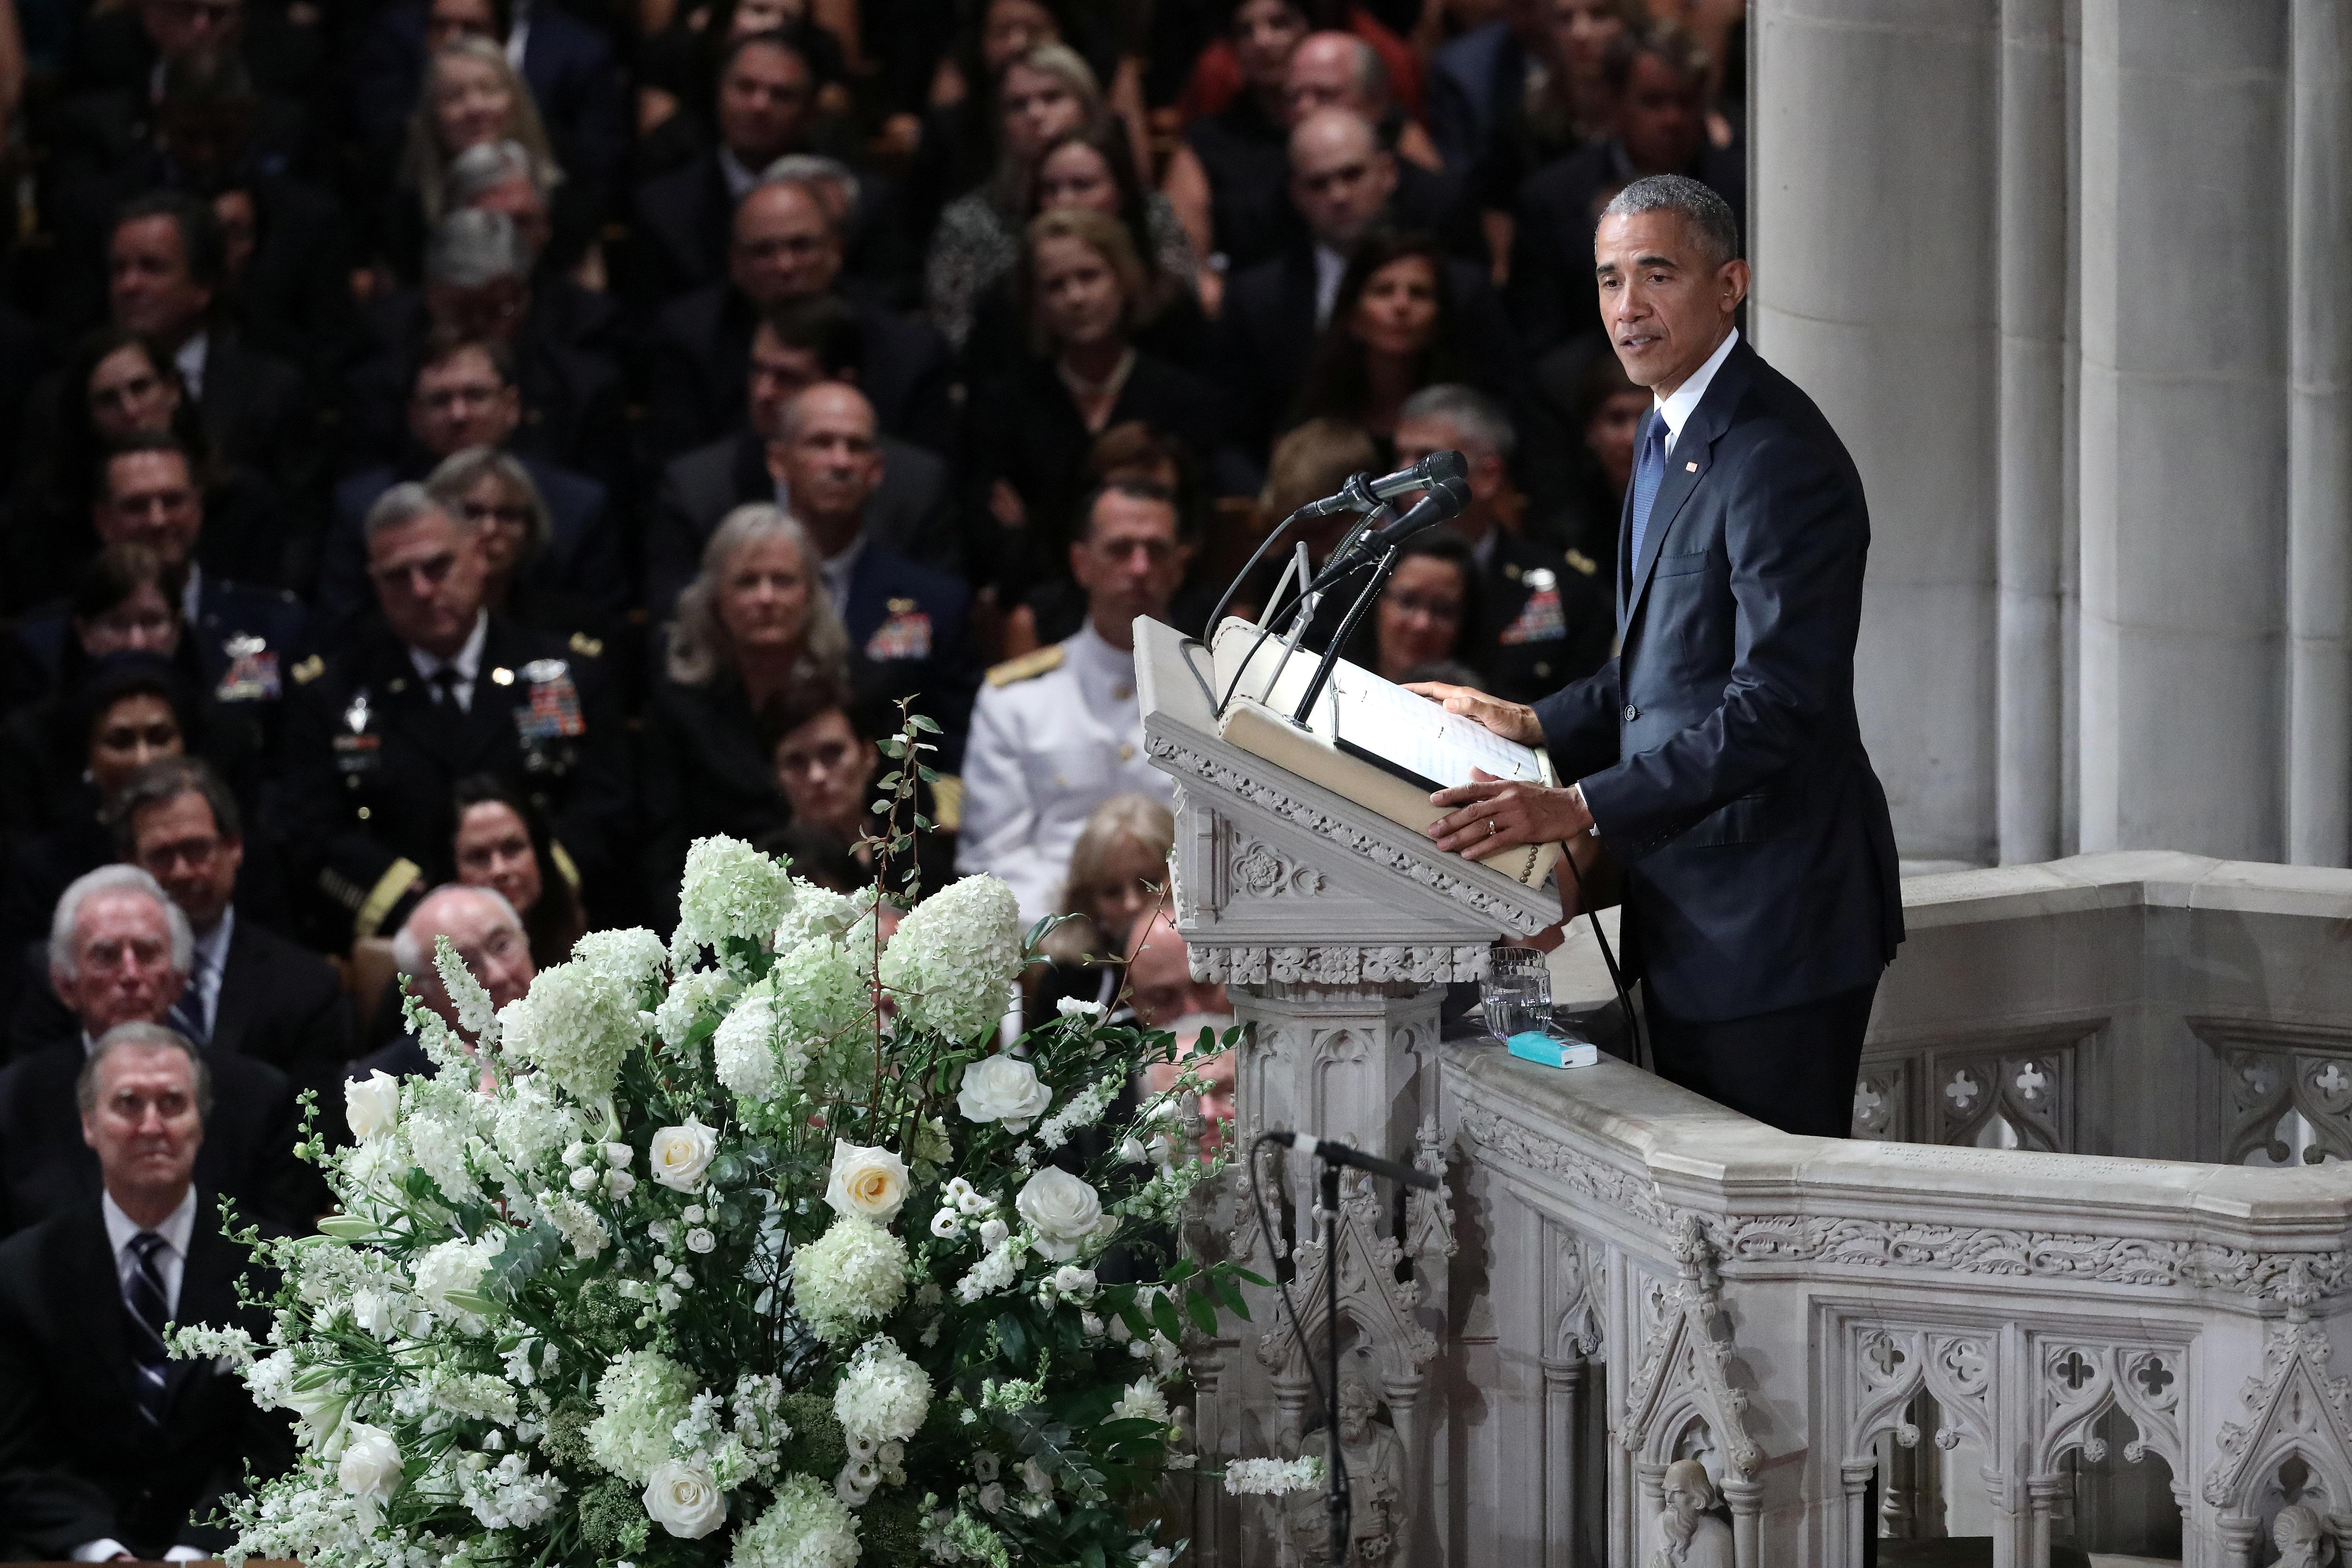 Former U.S. President Barack Obama speaks at the memorial service of U.S. Senator John McCain (R-AZ) at National Cathedral in Washington, U.S., September 1, 2018.      REUTERS/Chris Wattie